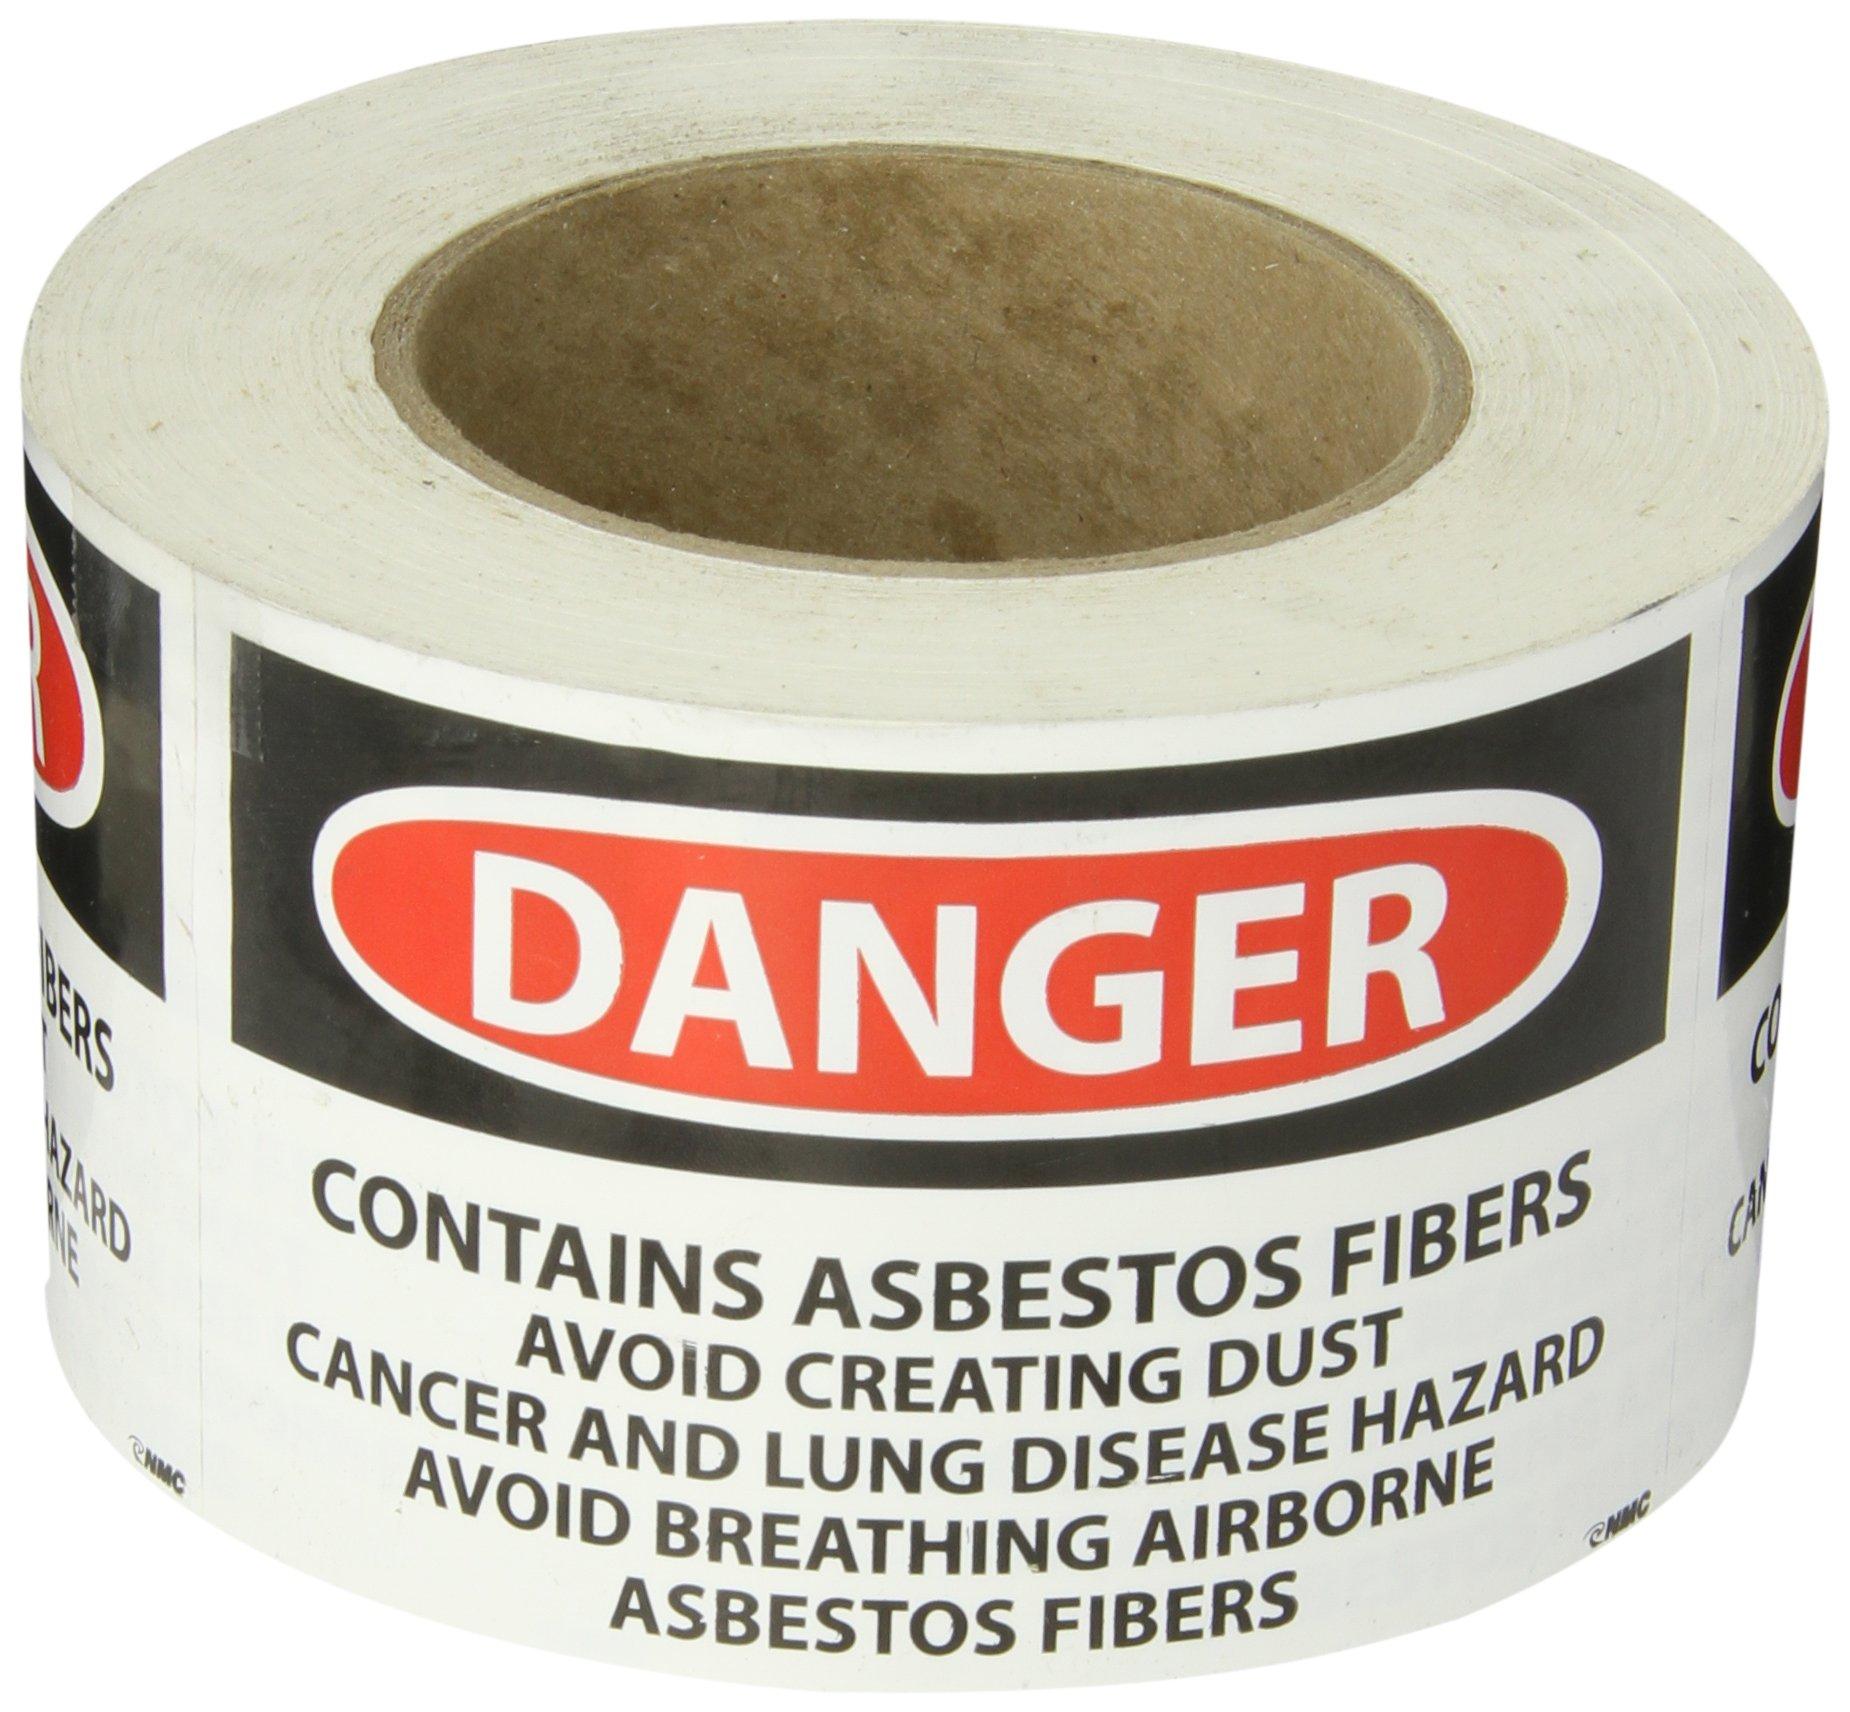 NMC VRD82 Hazard Warning Label, ''DANGER CONTAINS ASBESTOS FIBERS...etc'', 5'' Width x 3'' Height, Pressure Sensitive Vinyl, Red/Black On White (Roll of 500)